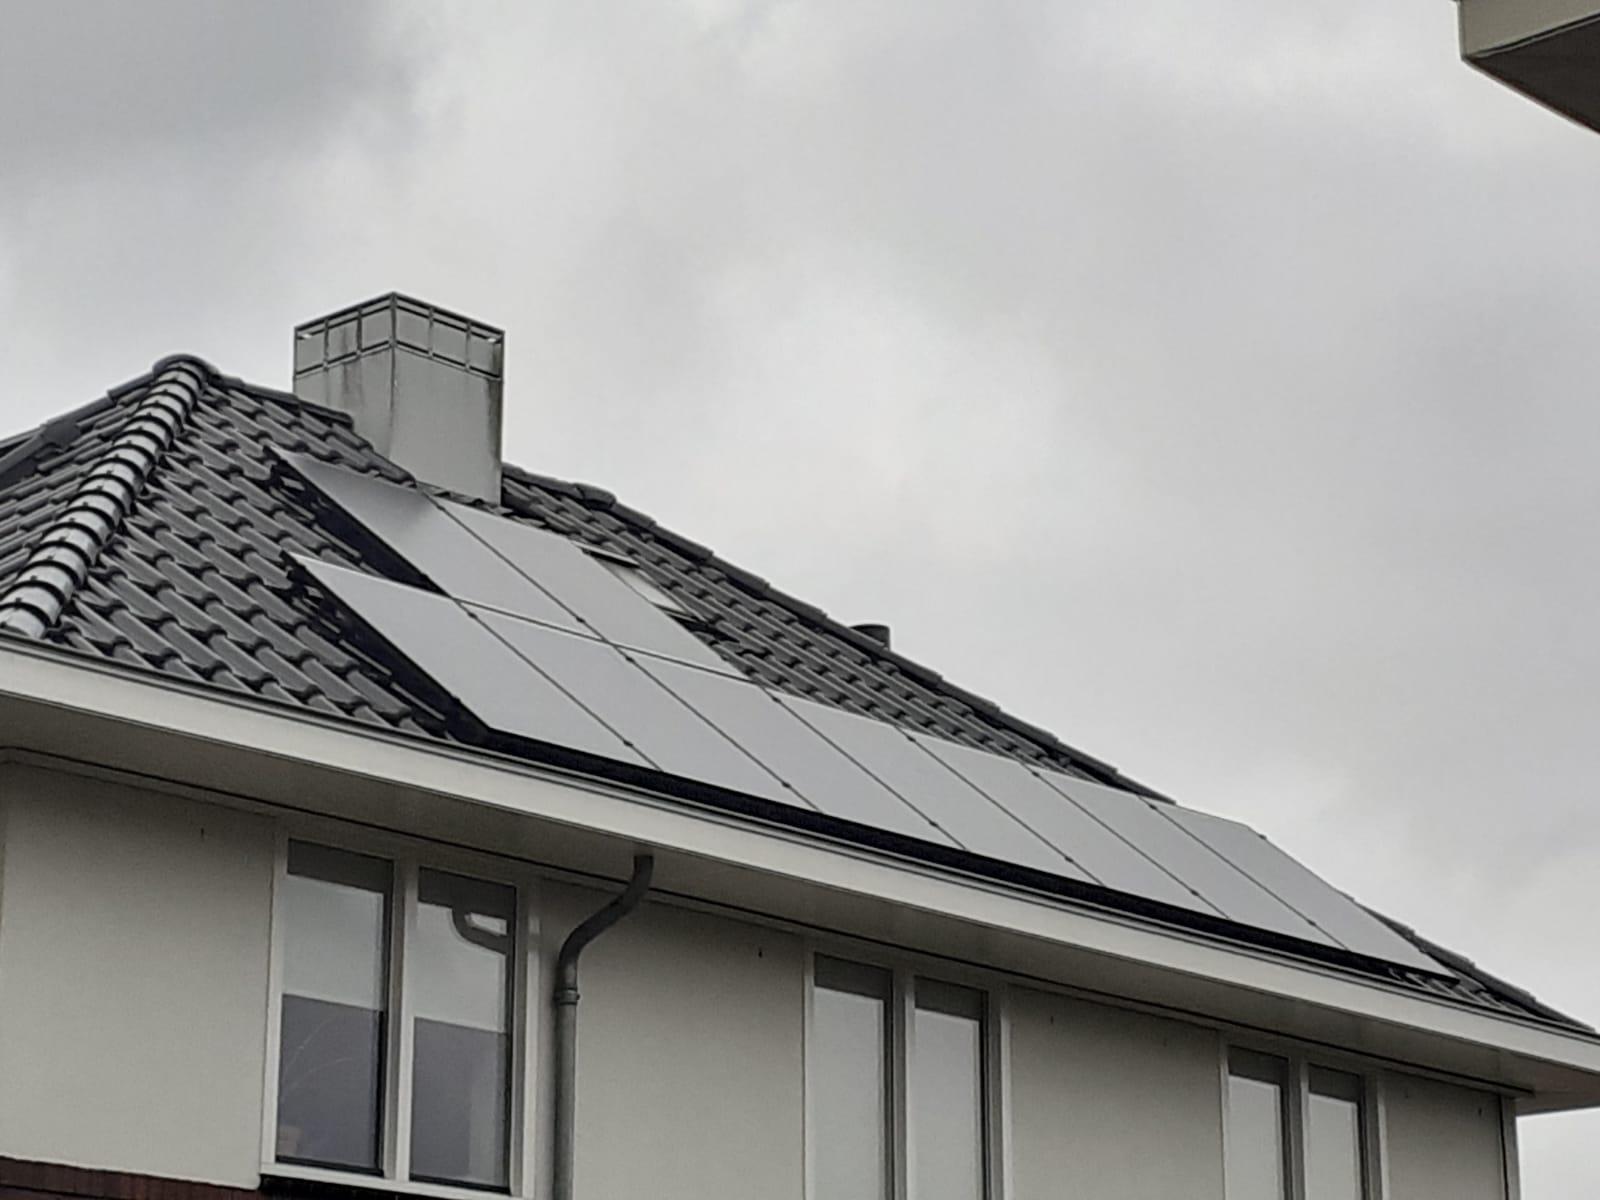 Solarwatt glas-glas zonnepanelen Beilen